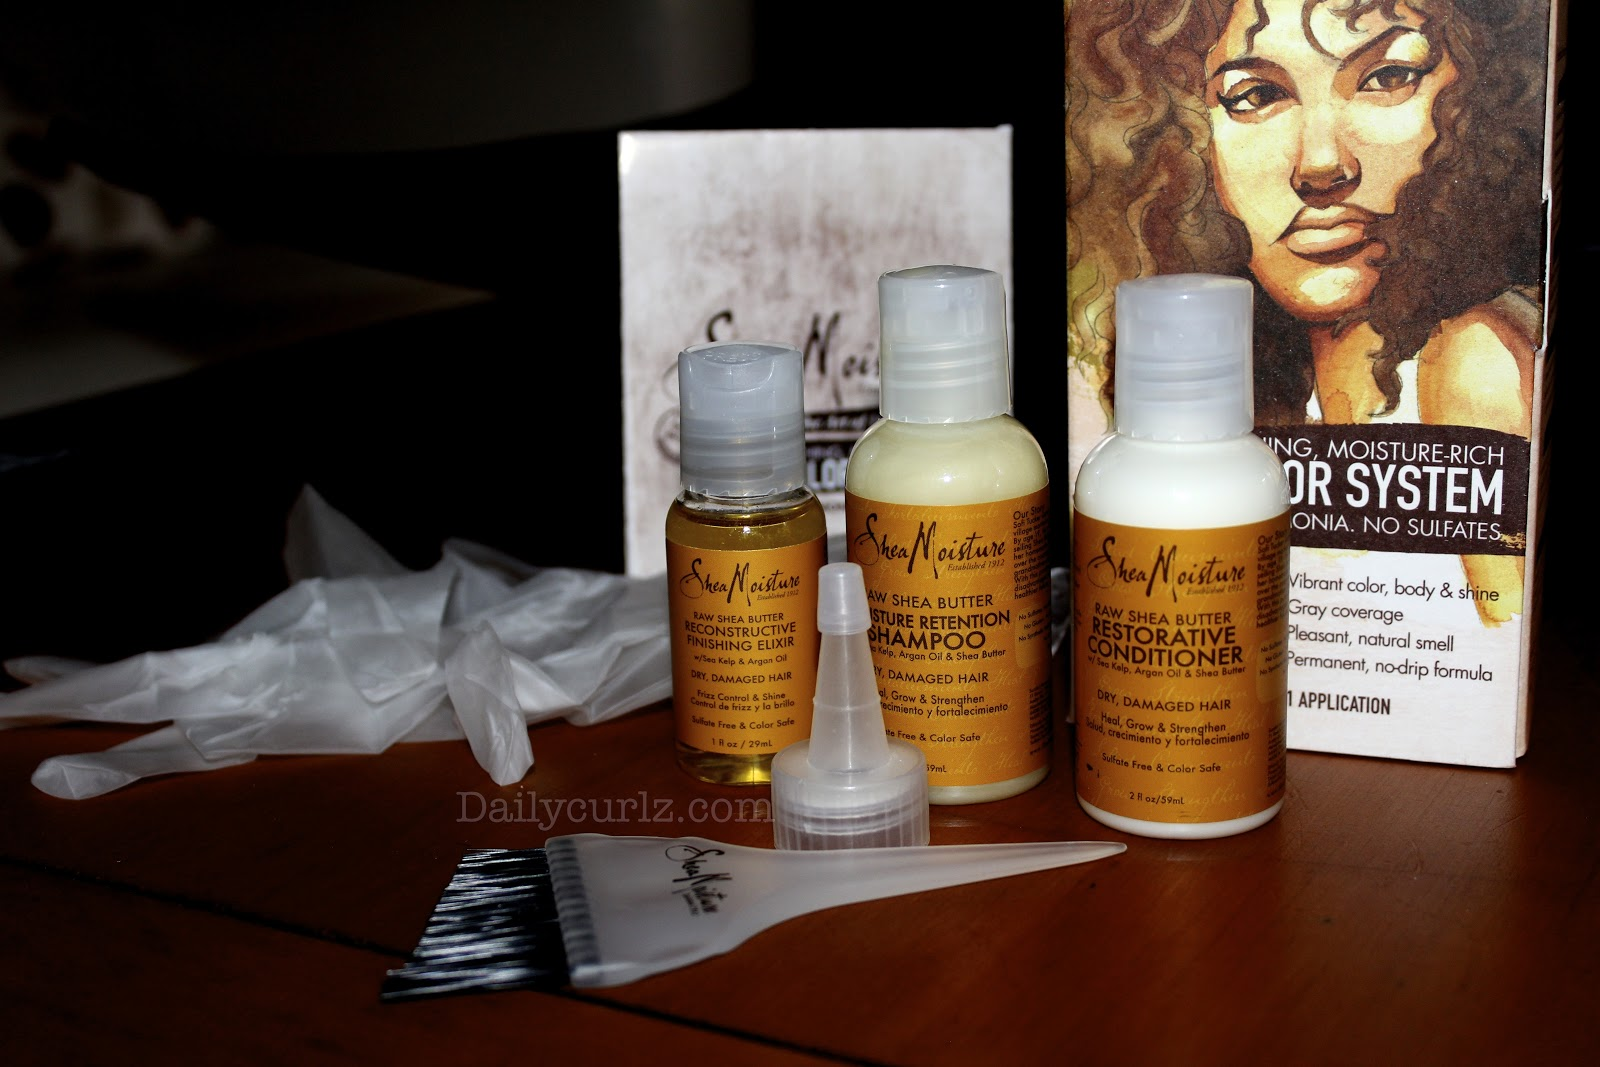 Sheamoisture Hair Color System Reviewresea Dailycurlz